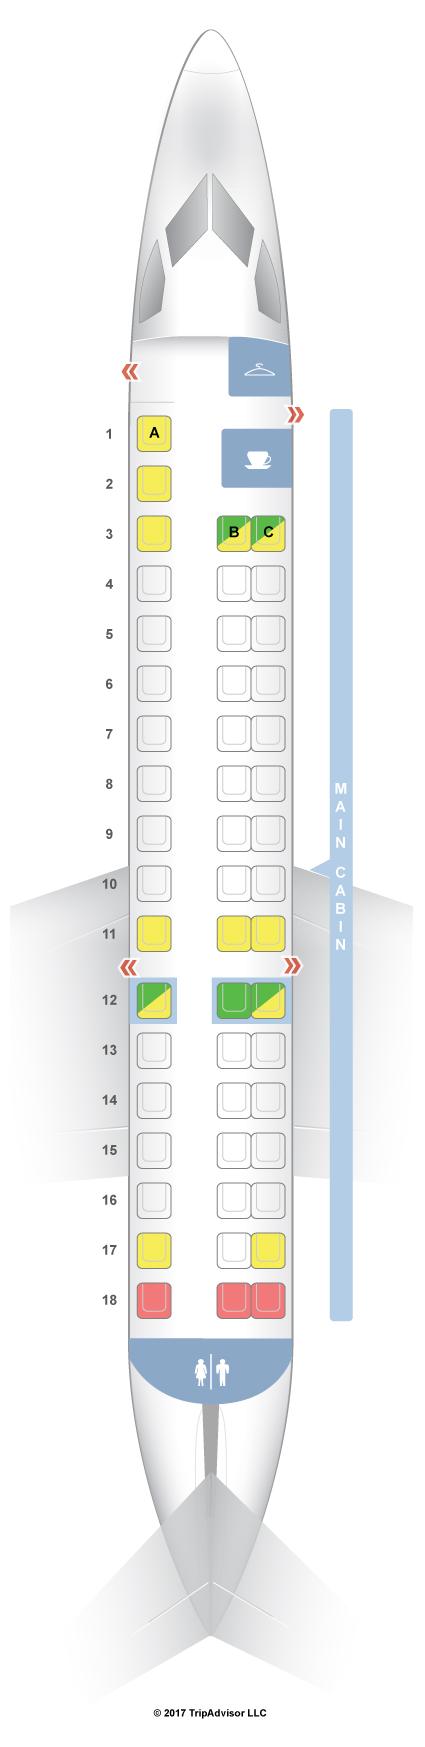 Seatguru Seat Map American Airlines Embraer Erj 145 Er4